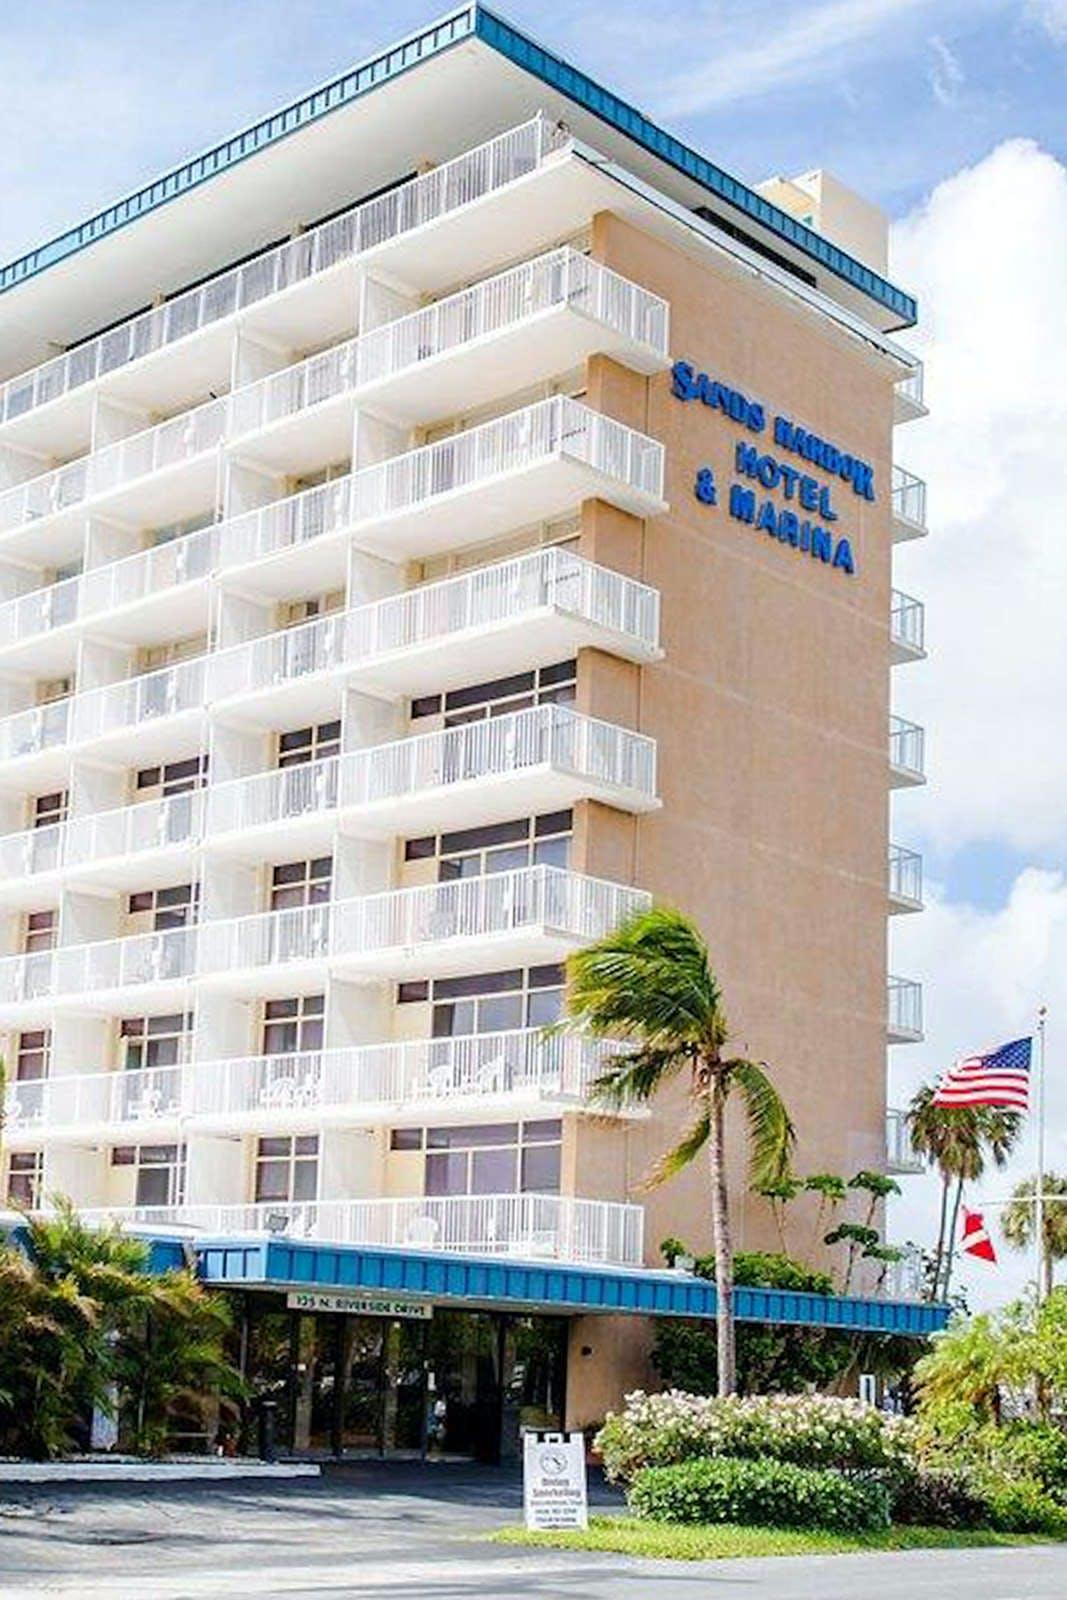 Sands Harbor Resort and Marina